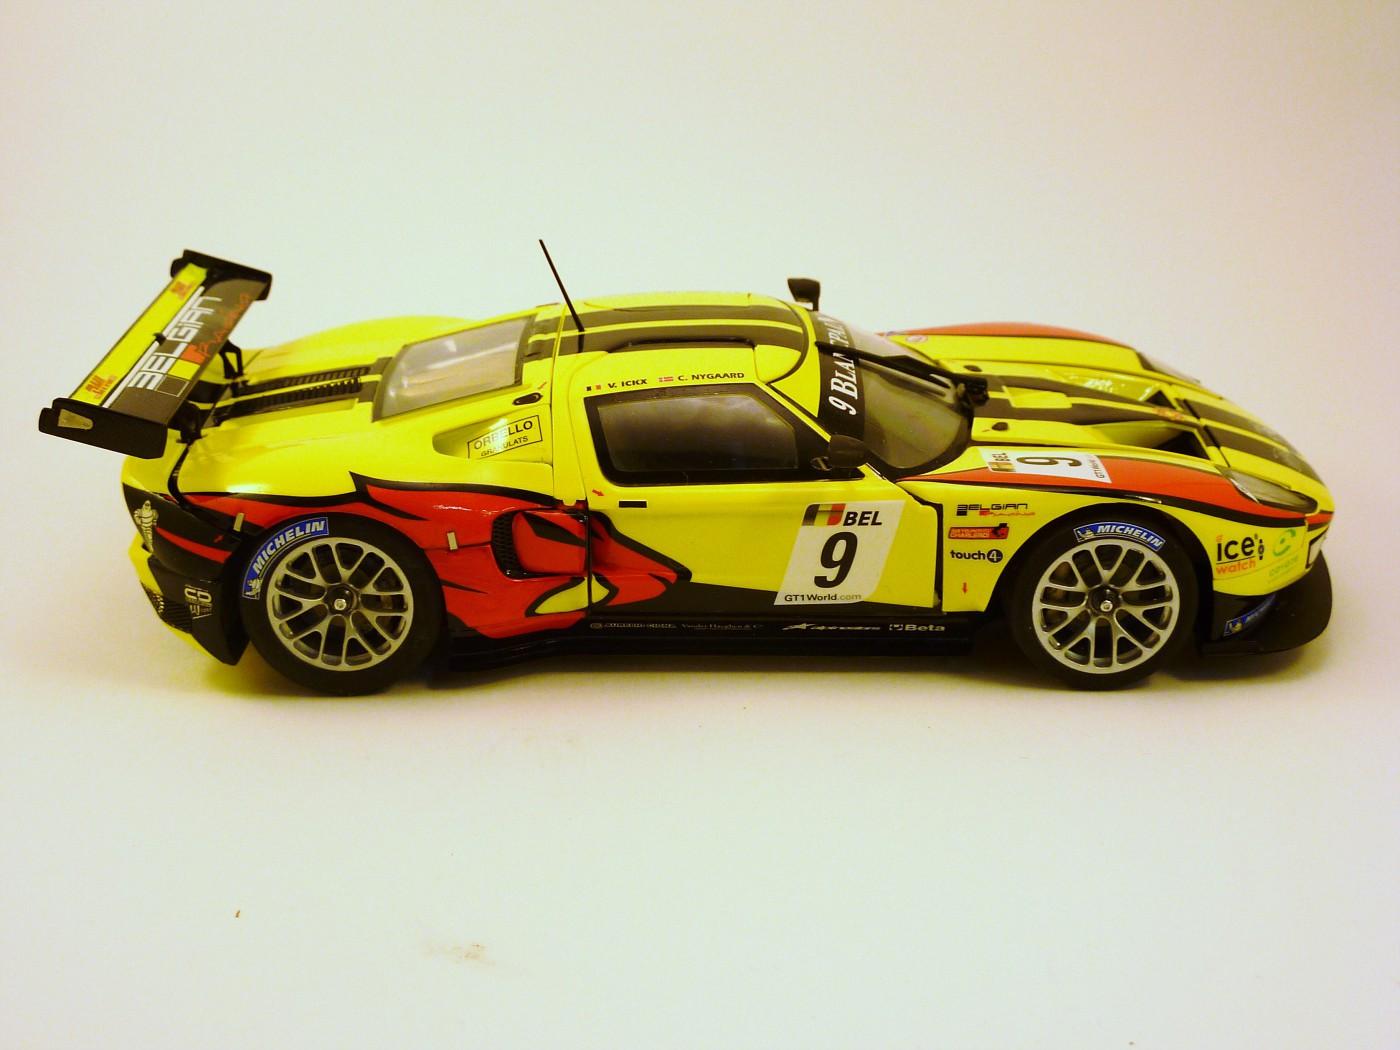 Ford gt1 Belgian racing FinalesFordGt1BelgianRacing012-vi